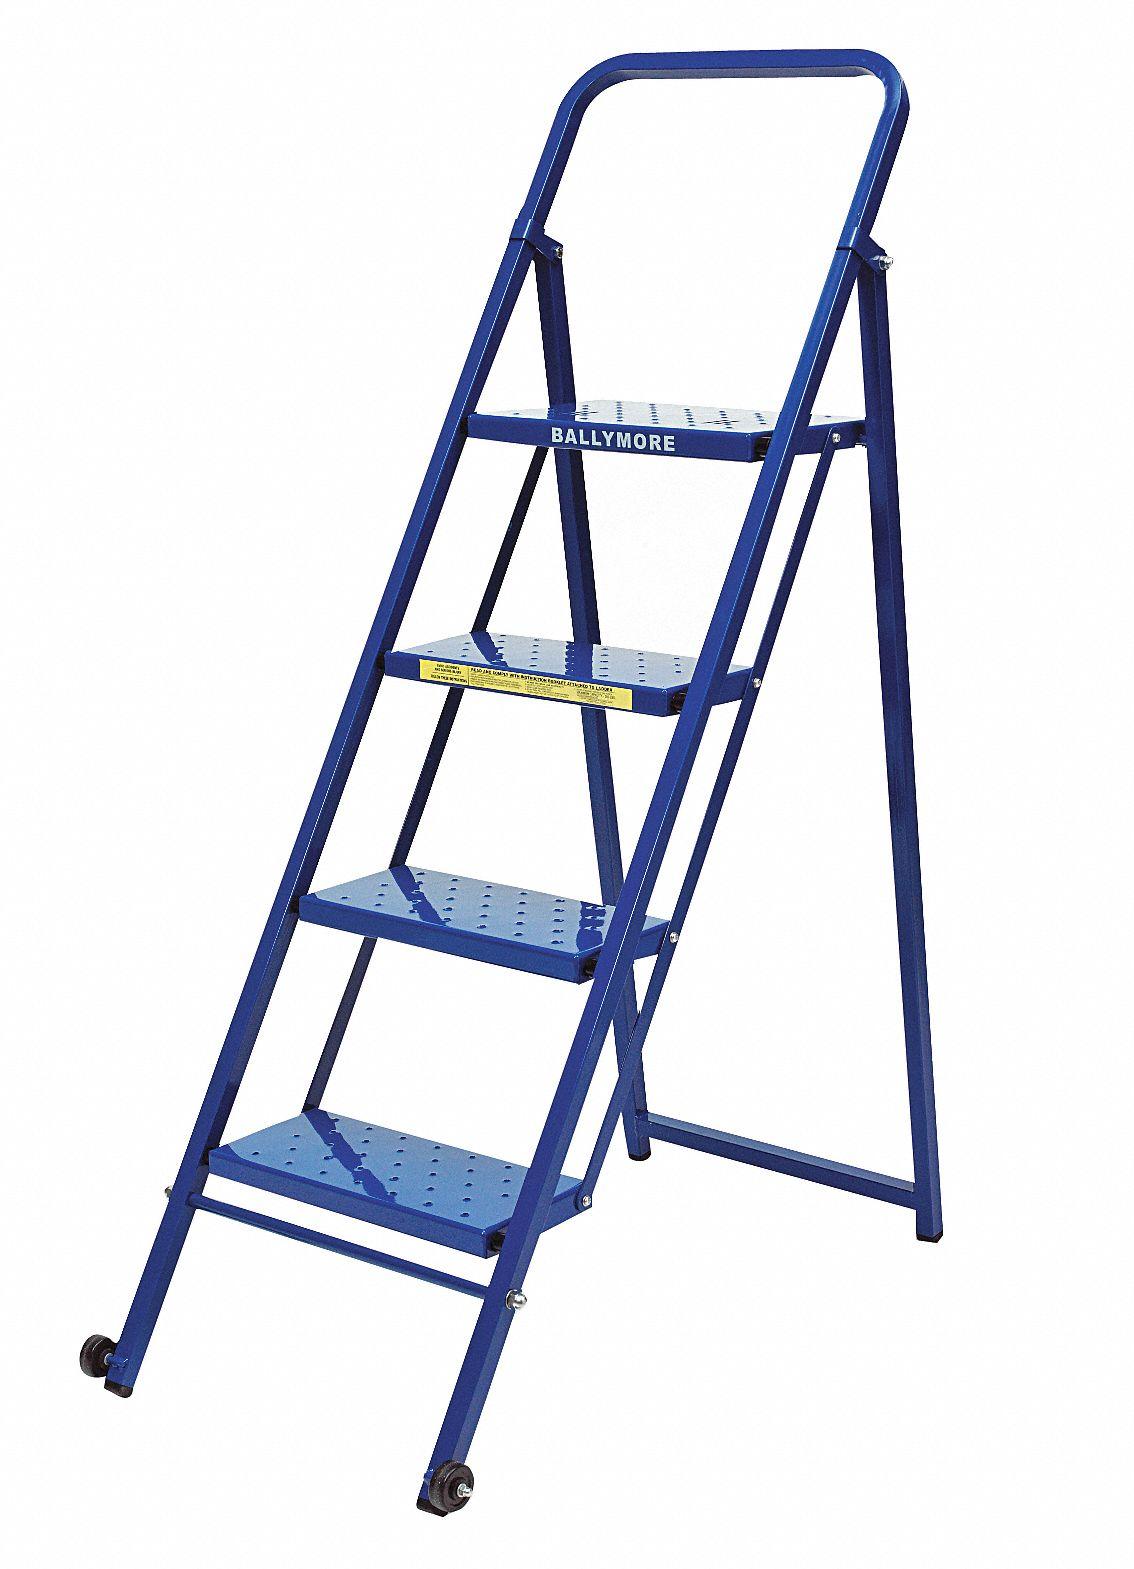 Ballymore Folding Rolling Ladder Steel 40 In H 9l881